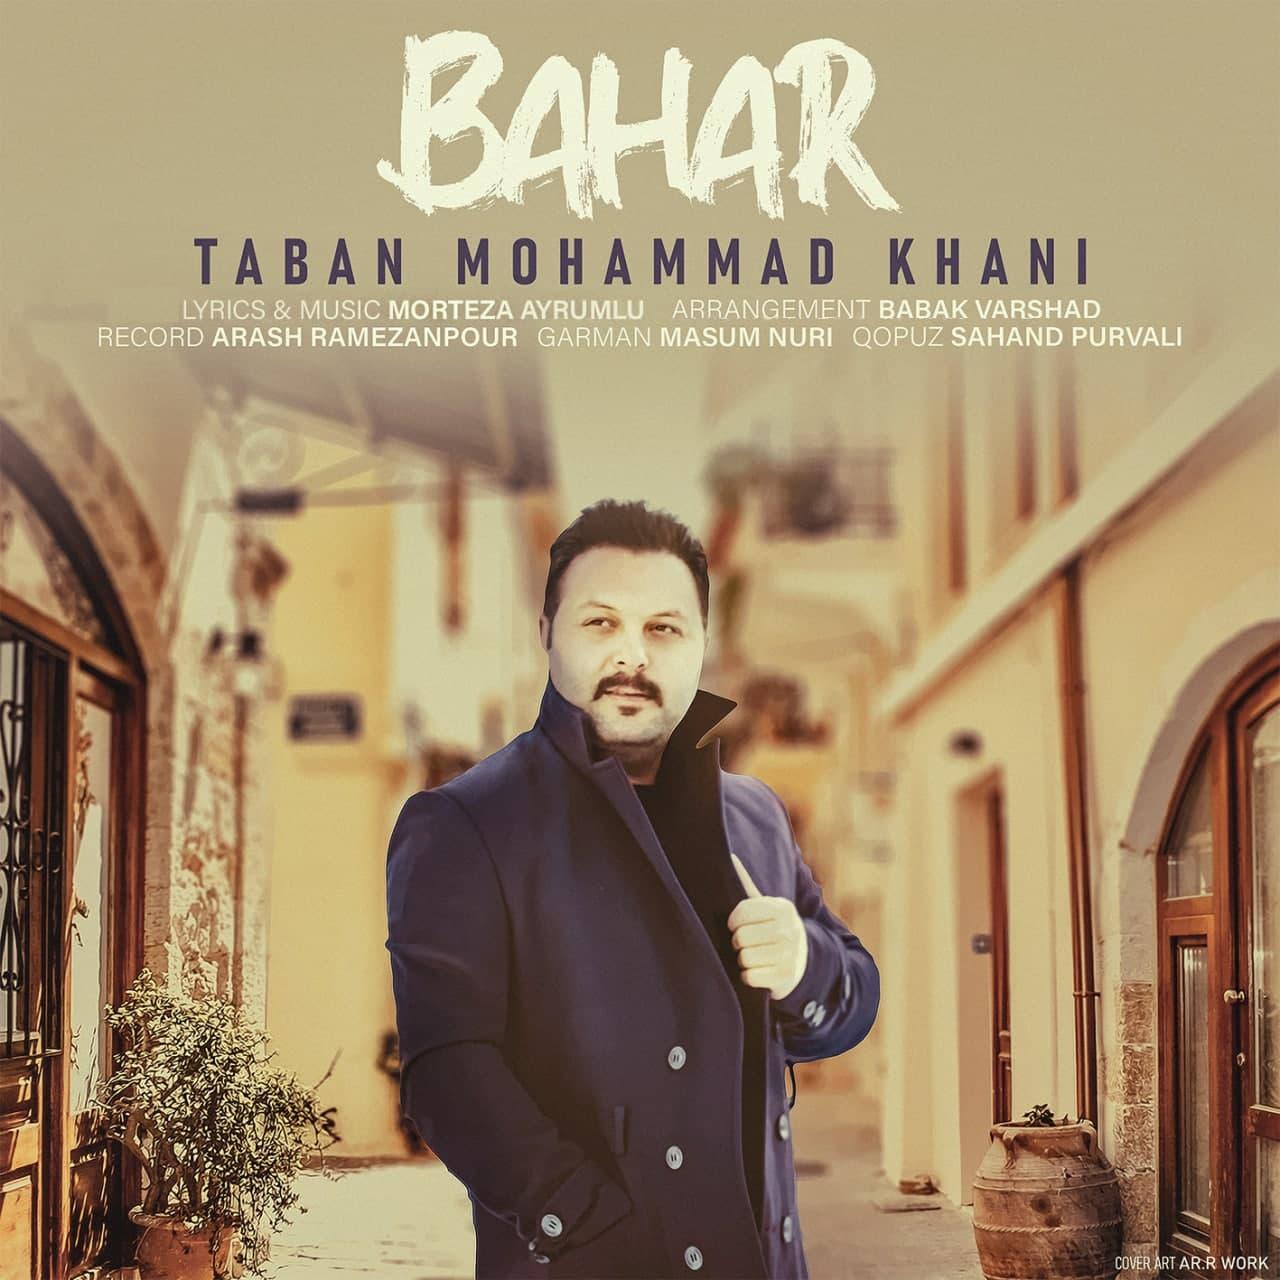 https://s19.picofile.com/file/8433607392/14Taban_Mohammad_Khani_Bahar.jpg